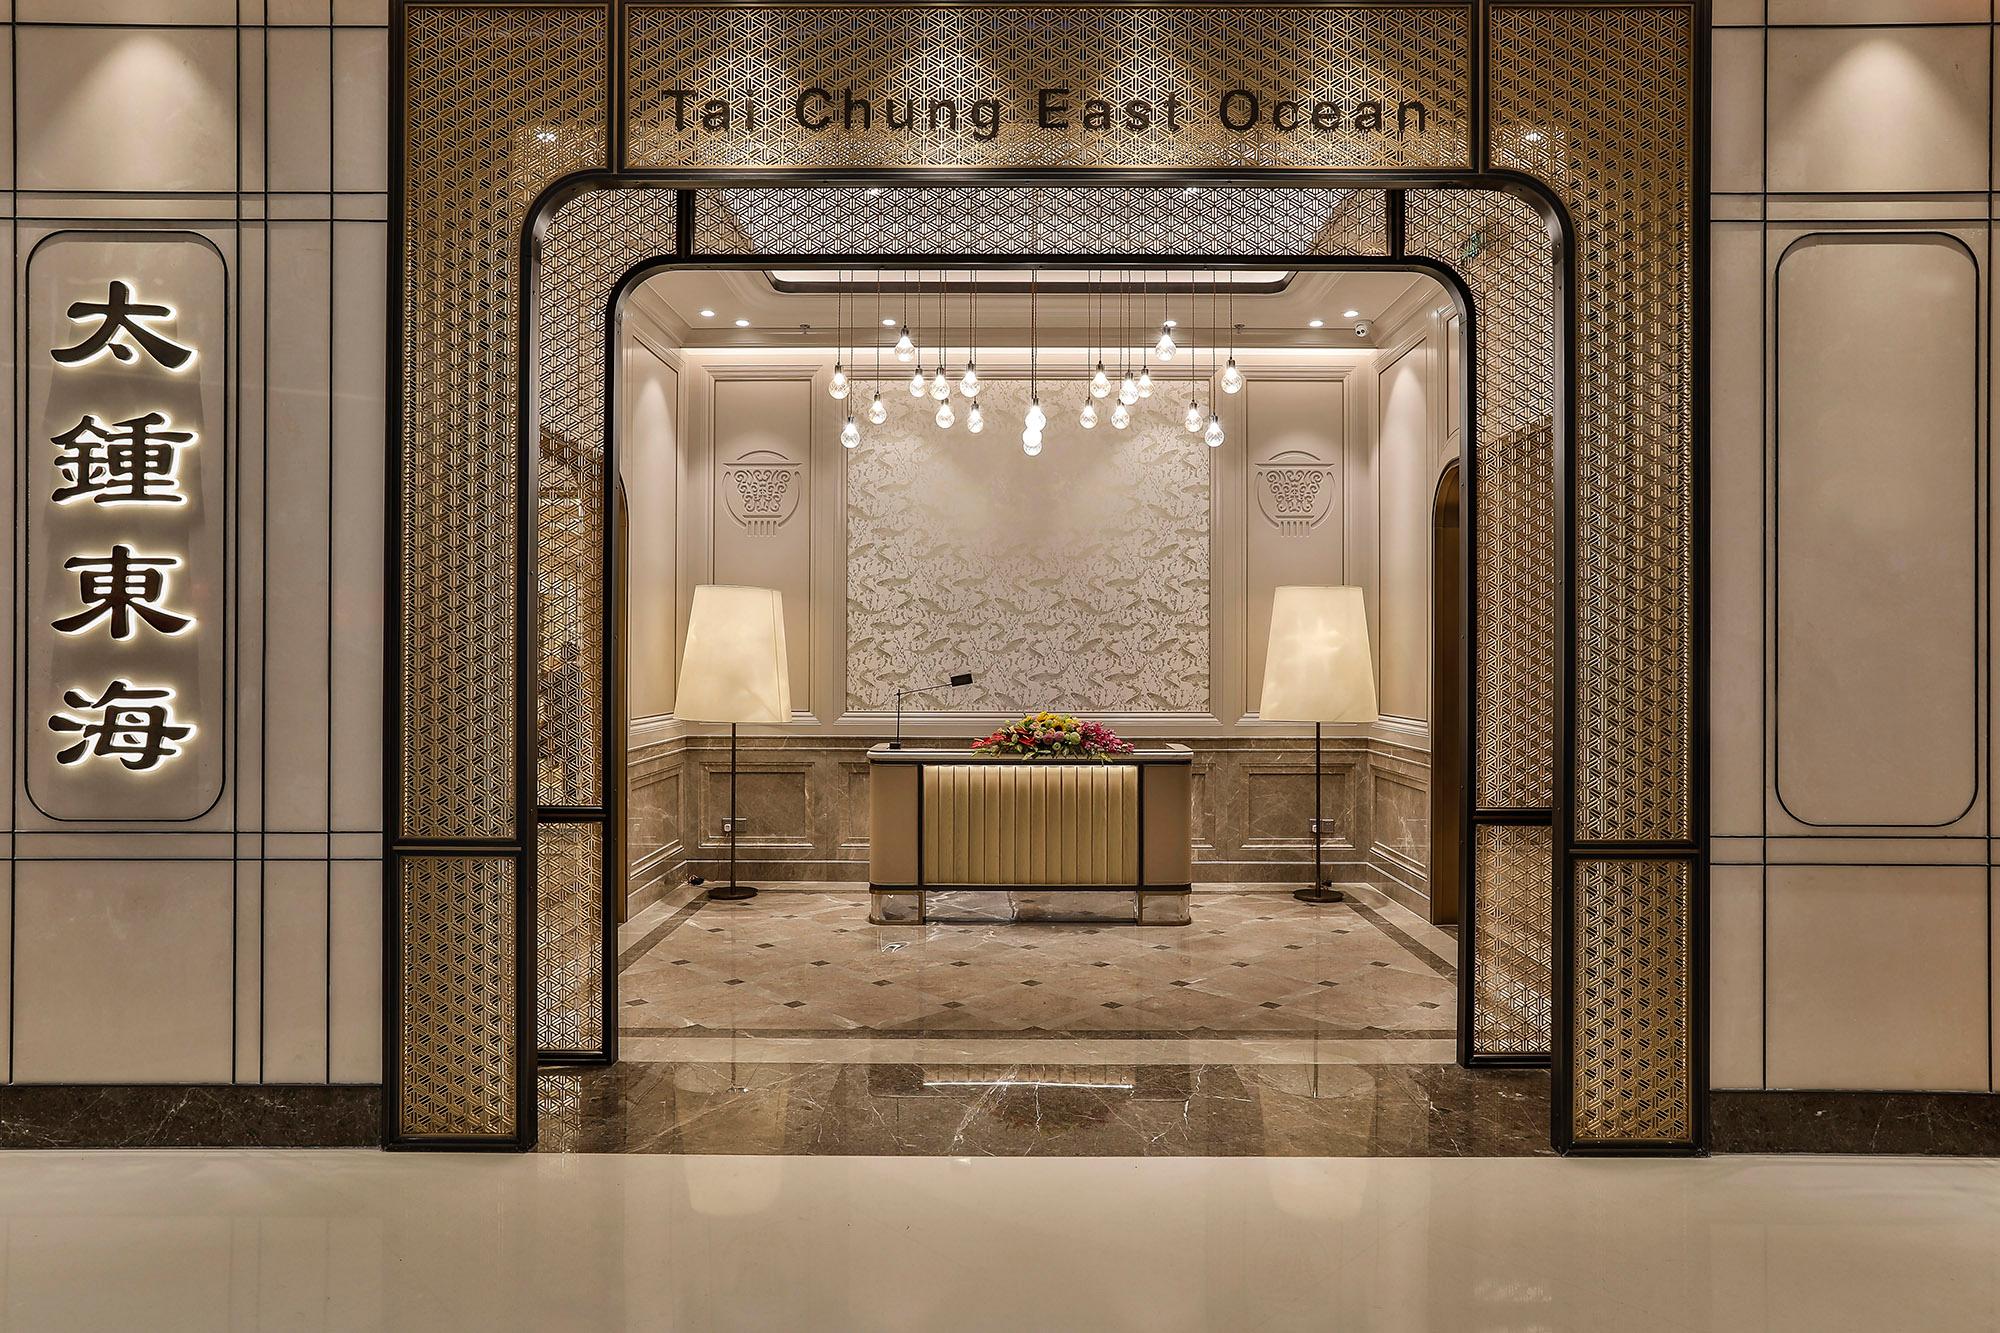 Tai Chung East Ocean